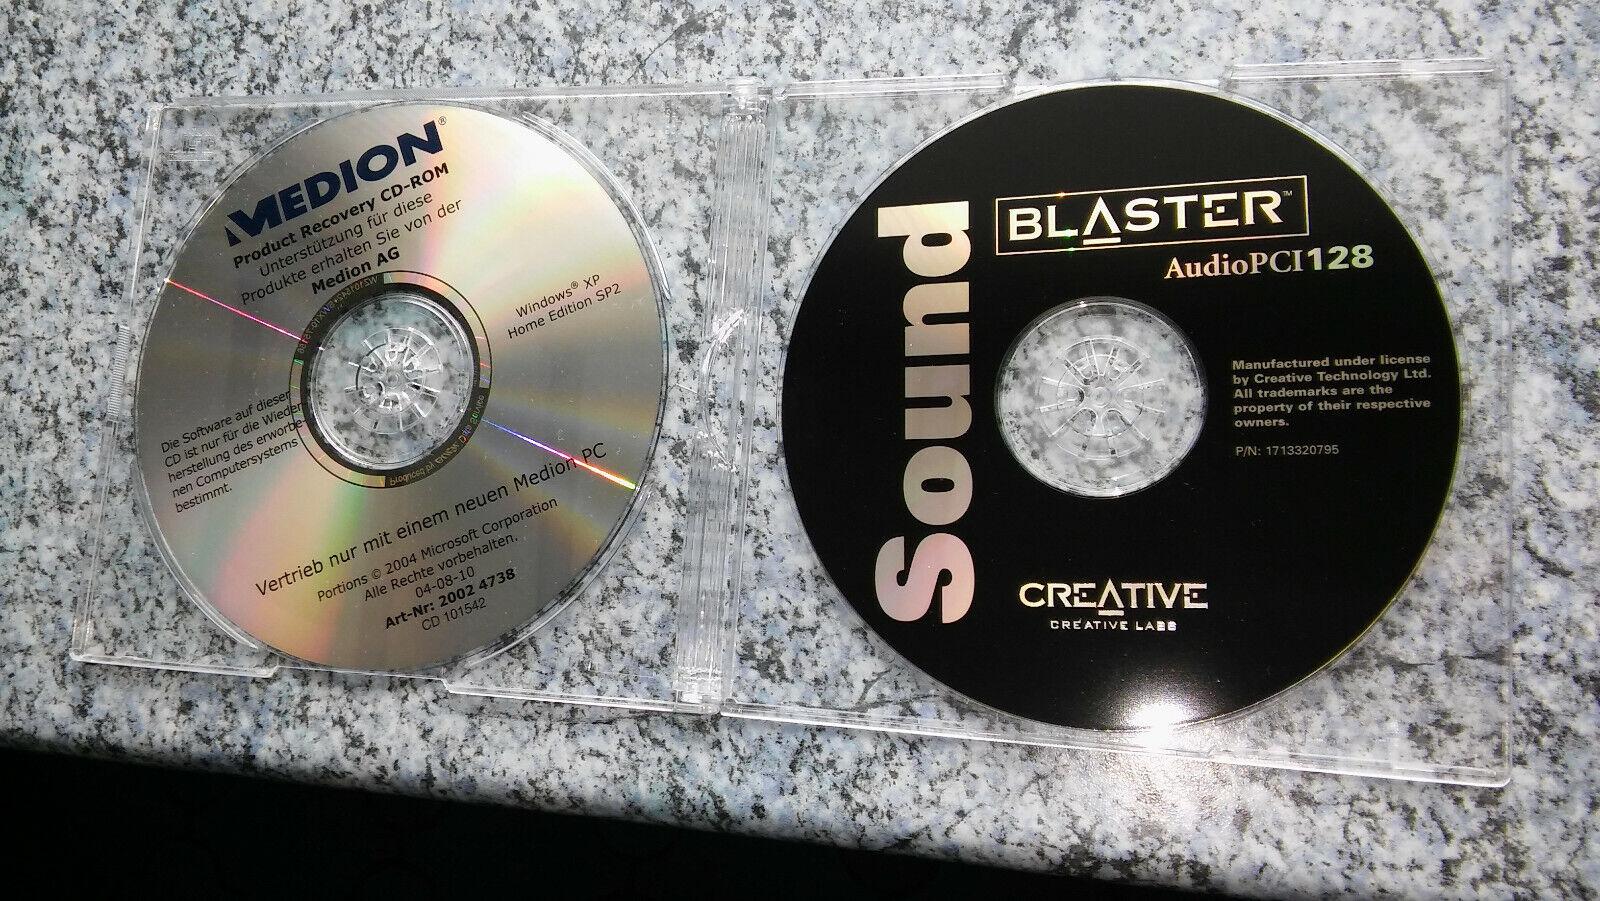 Cd Rom Medion Recovery Disk mit soundblaster Treiber win98